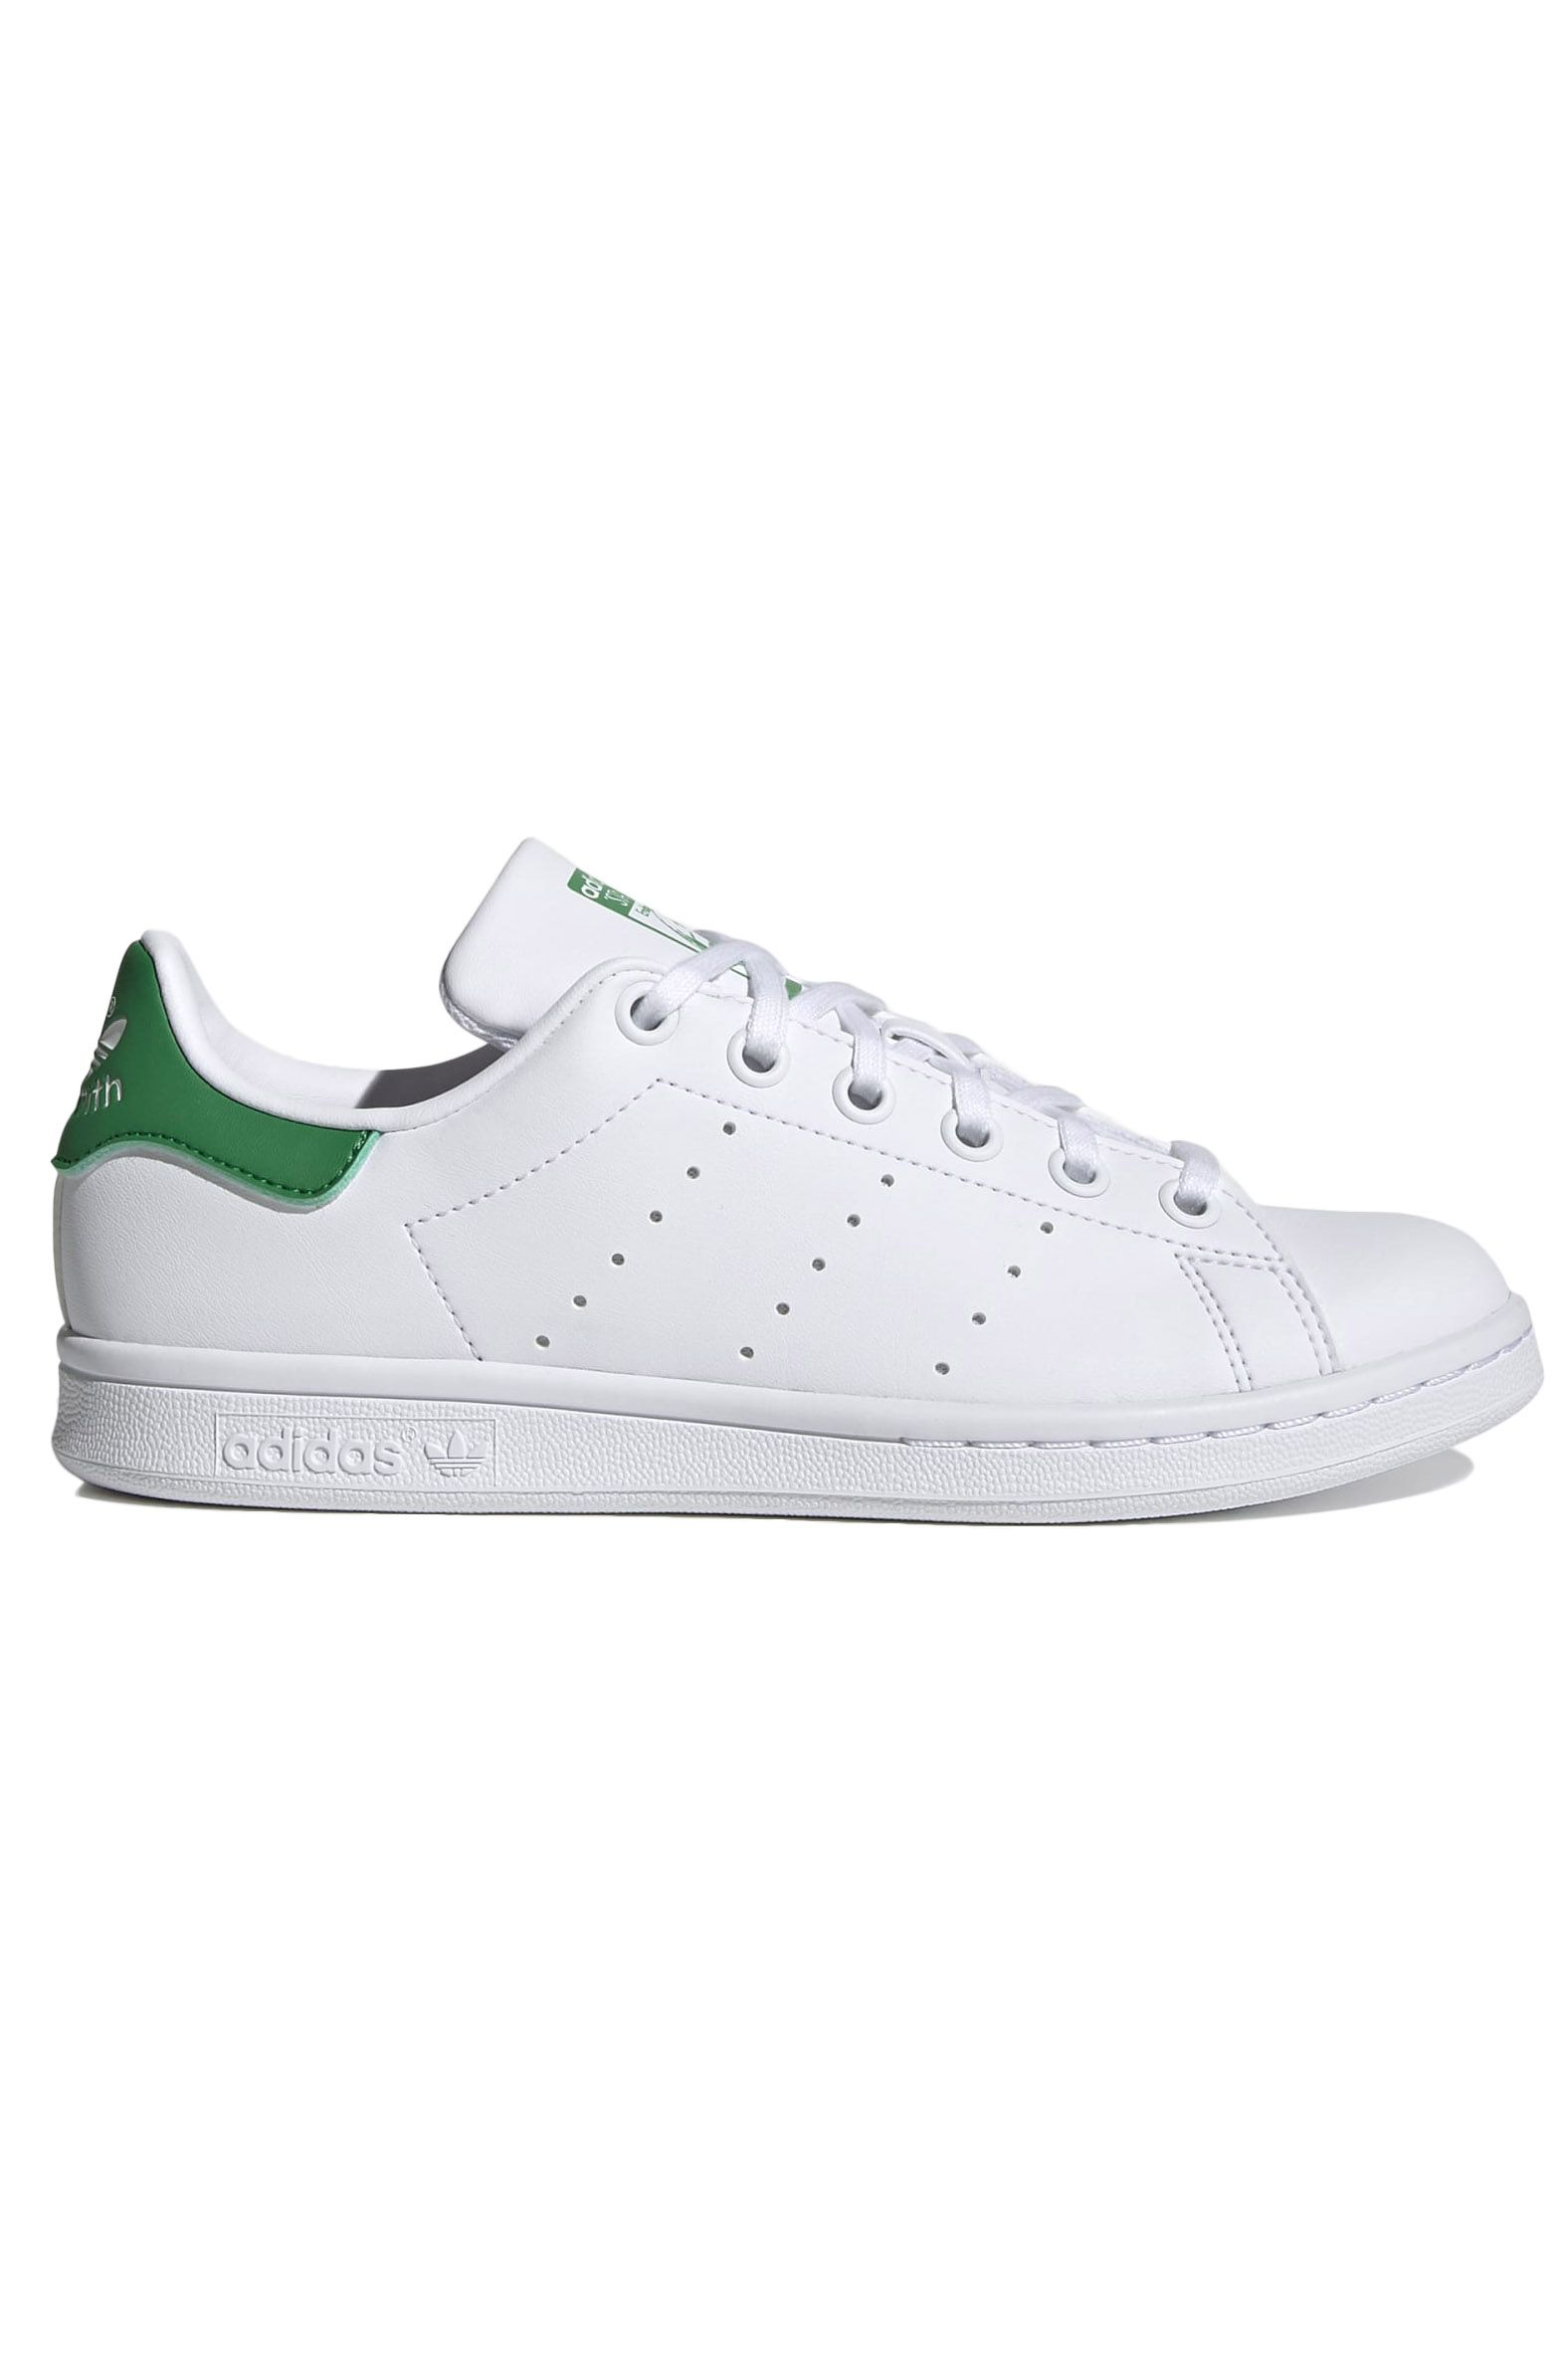 Adidas Shoes STAN SMITH J Ftwr White/Ftwr White/Green